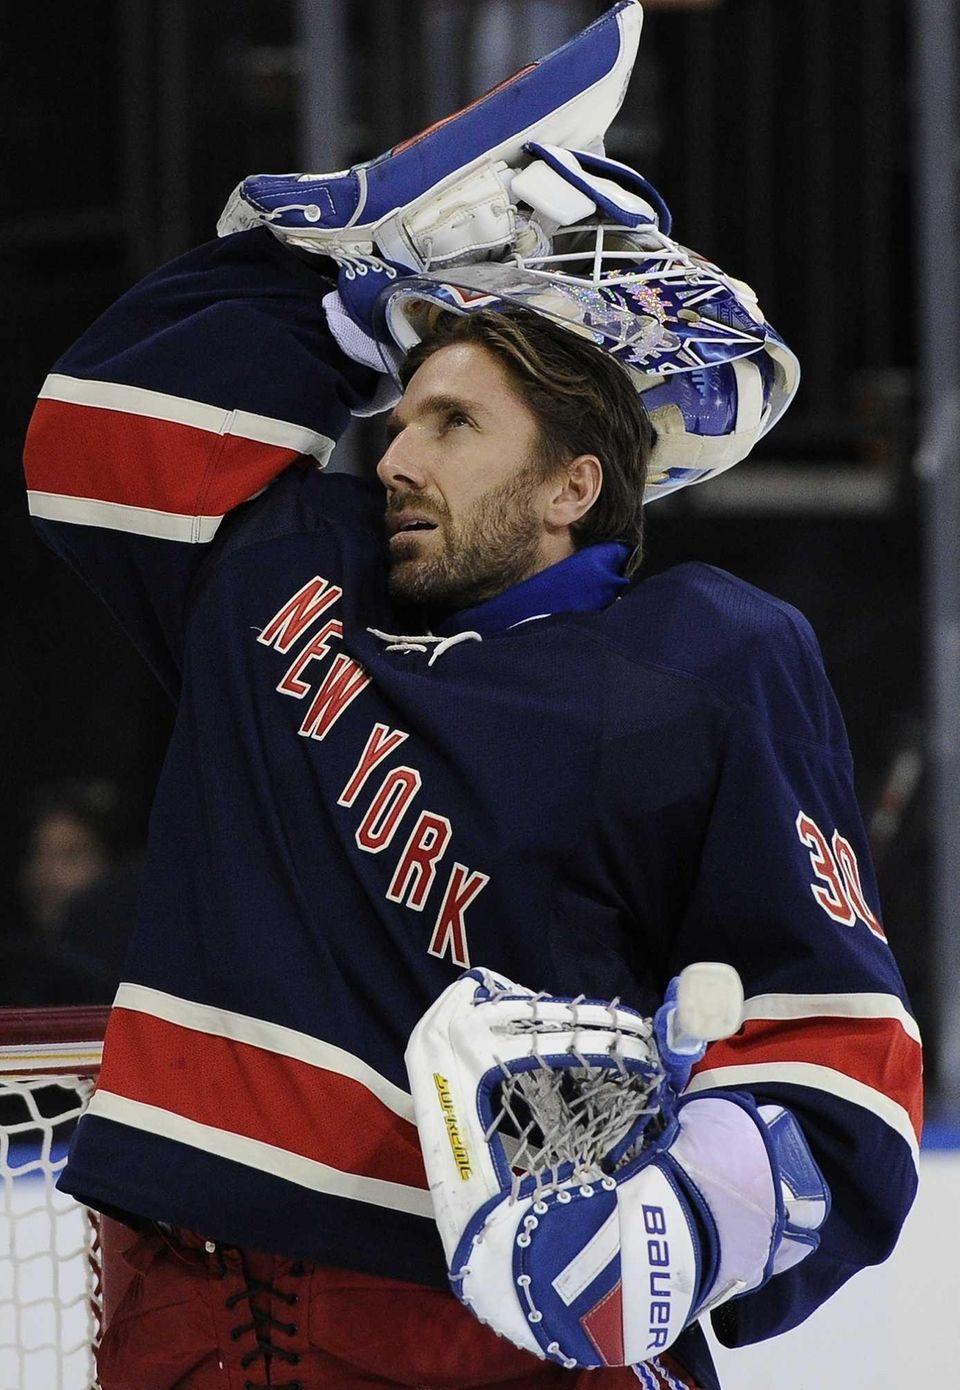 Rangers goalie Henrik Lundqvist put on his mask